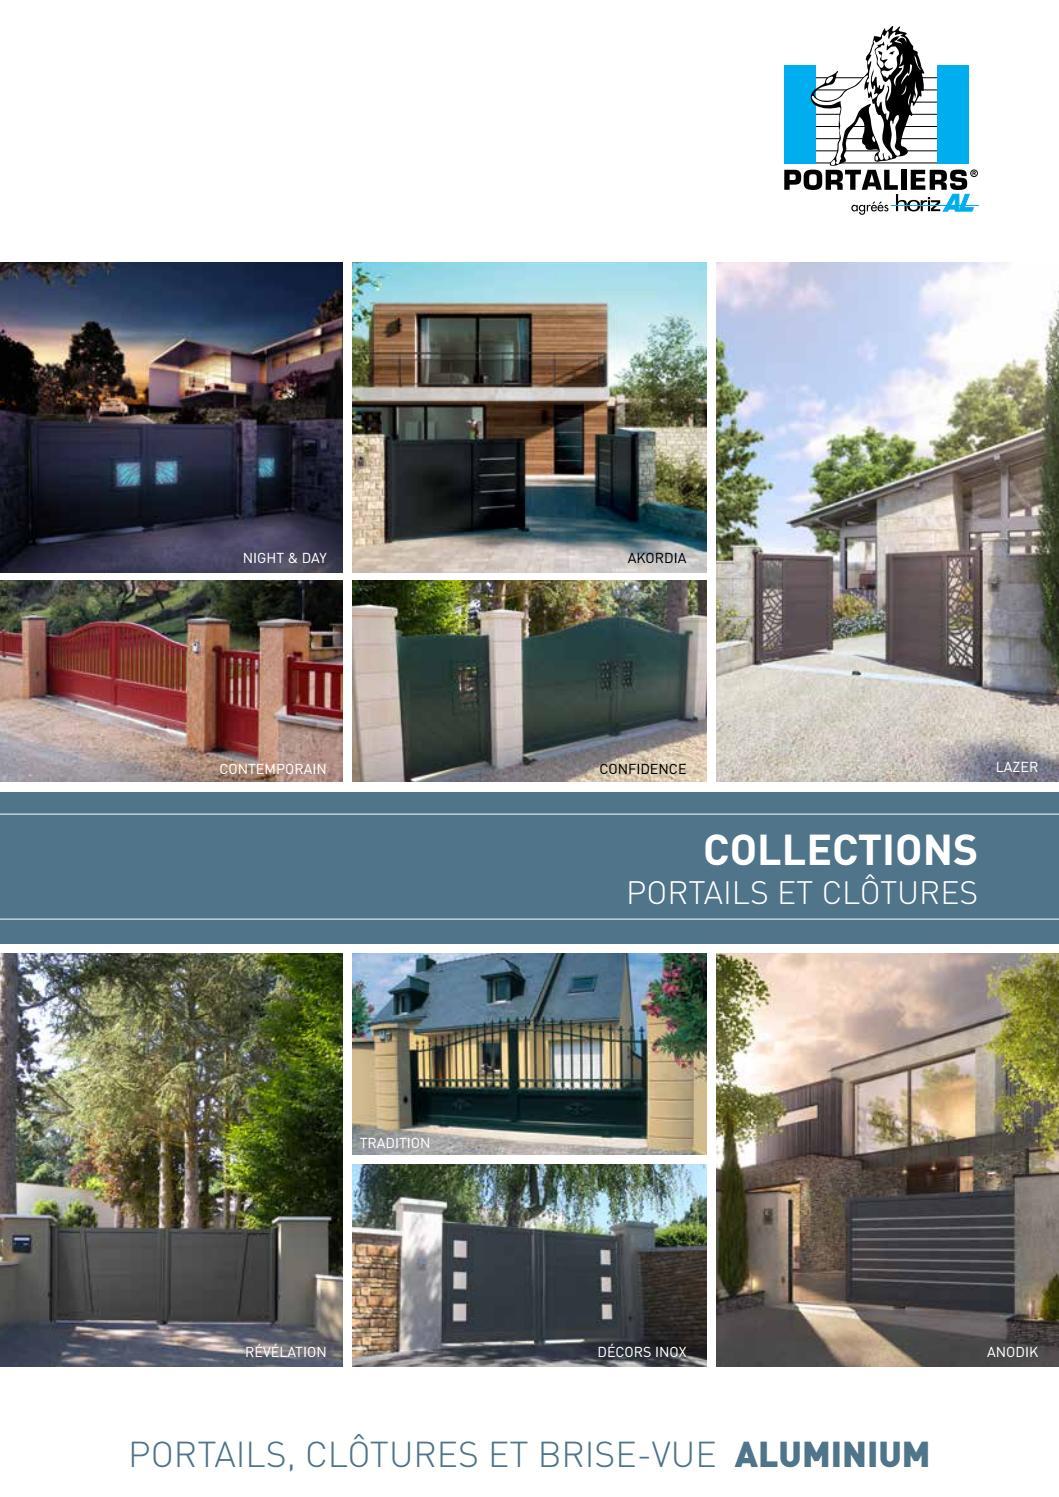 portails horizal en aluminium 2 by sitti issuu. Black Bedroom Furniture Sets. Home Design Ideas